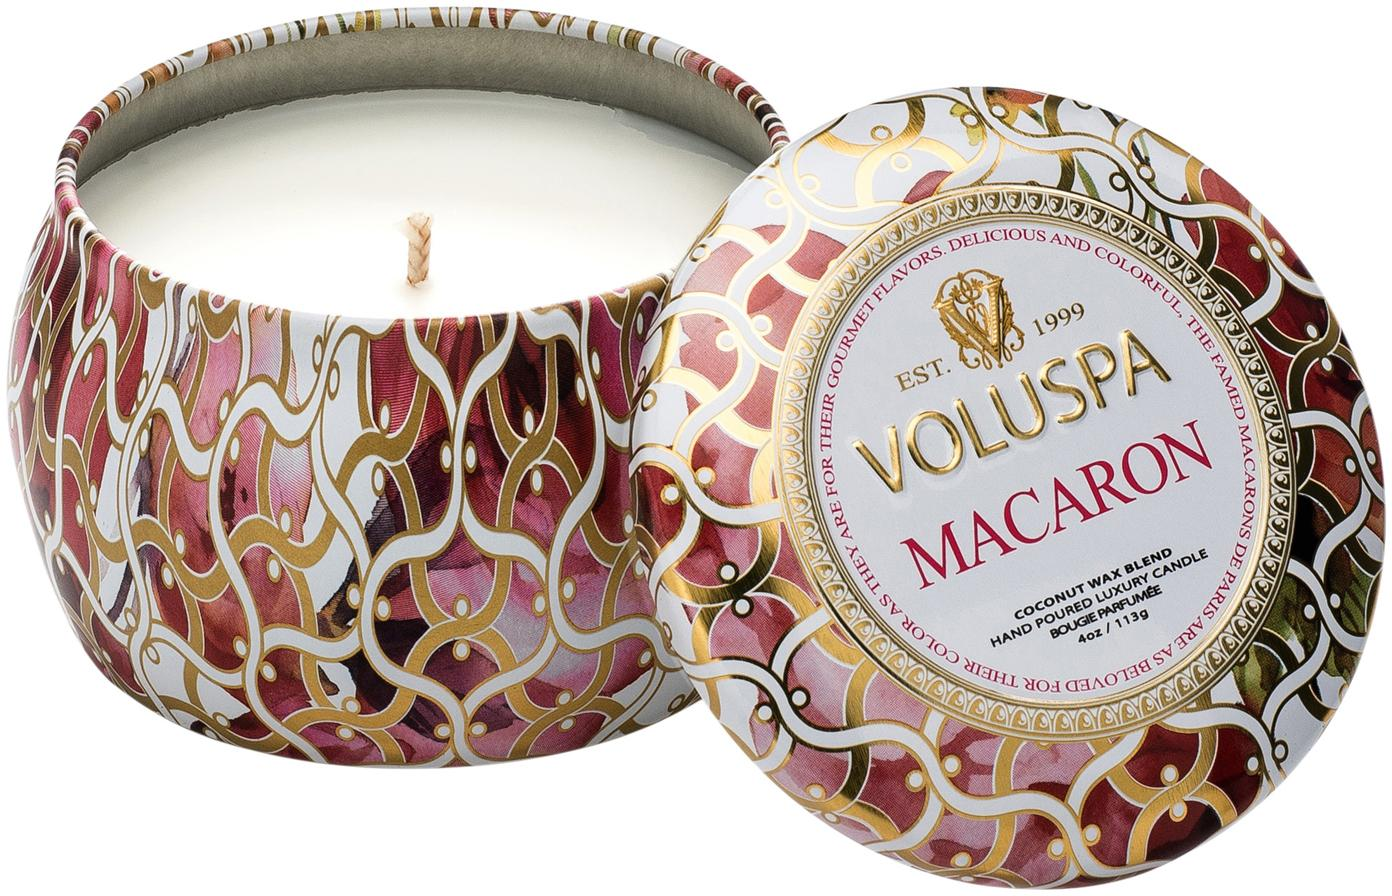 Duftkerze Petite (Vanille & Süße Mandeln), Weiß, Gold, Rot, Ø 8 x H 5 cm